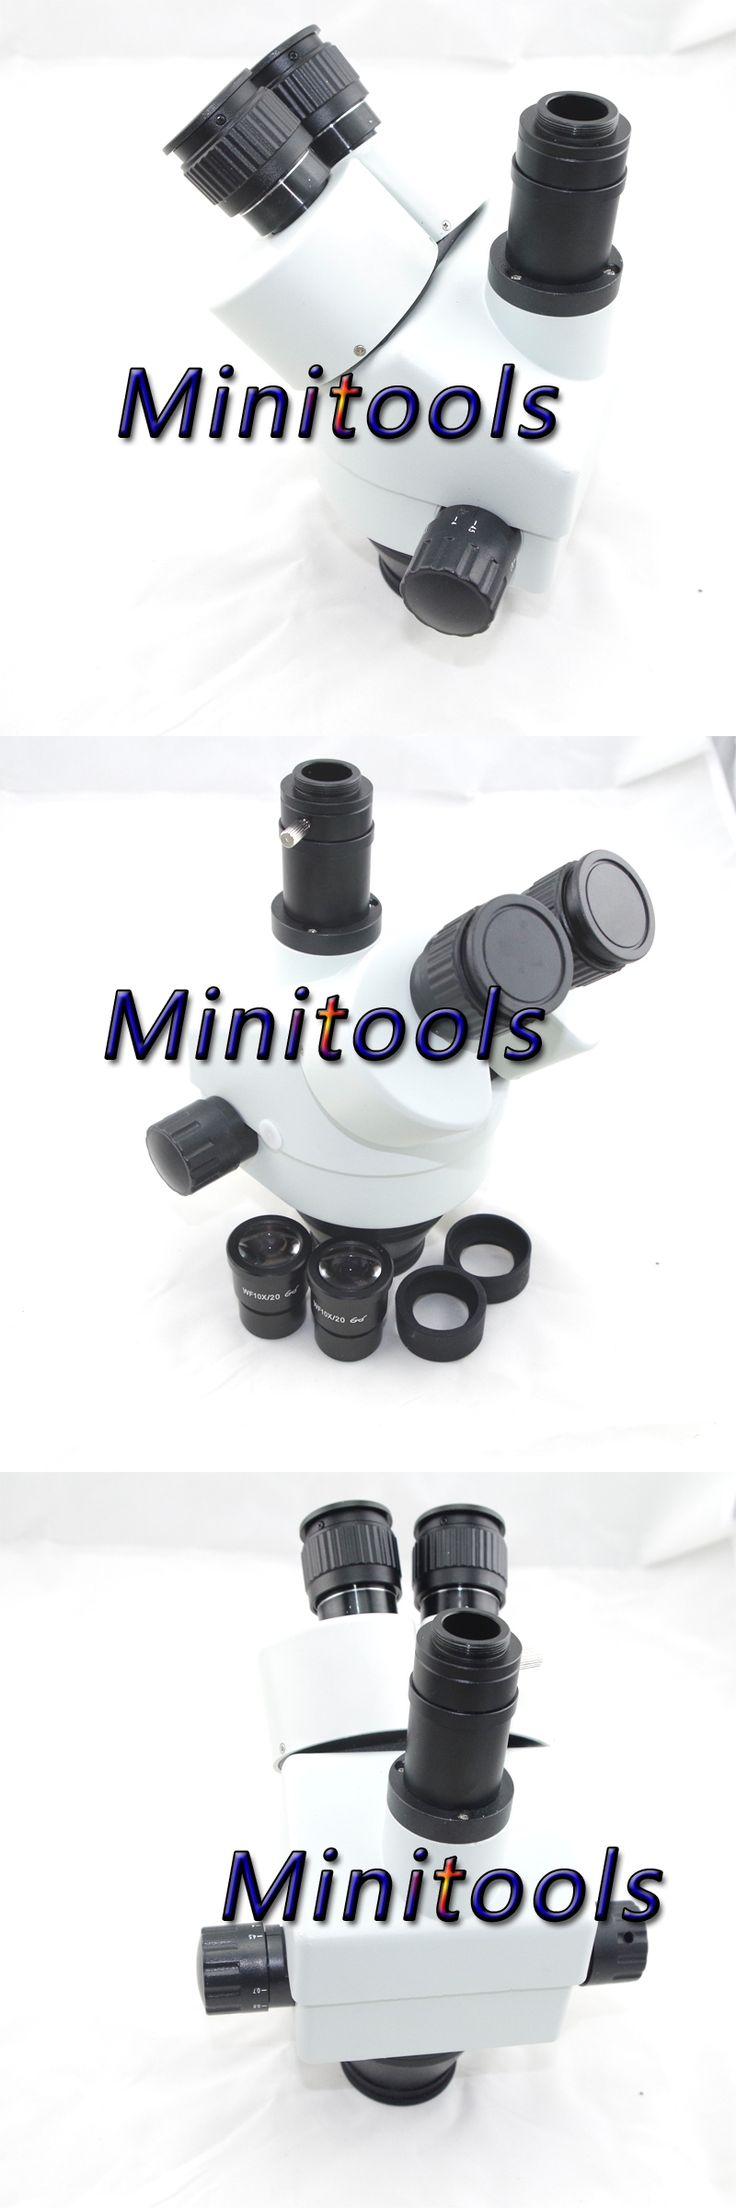 Continuous zoom binocular visual 7-90X Trinocular stereo microscope head for lab /PCB repair